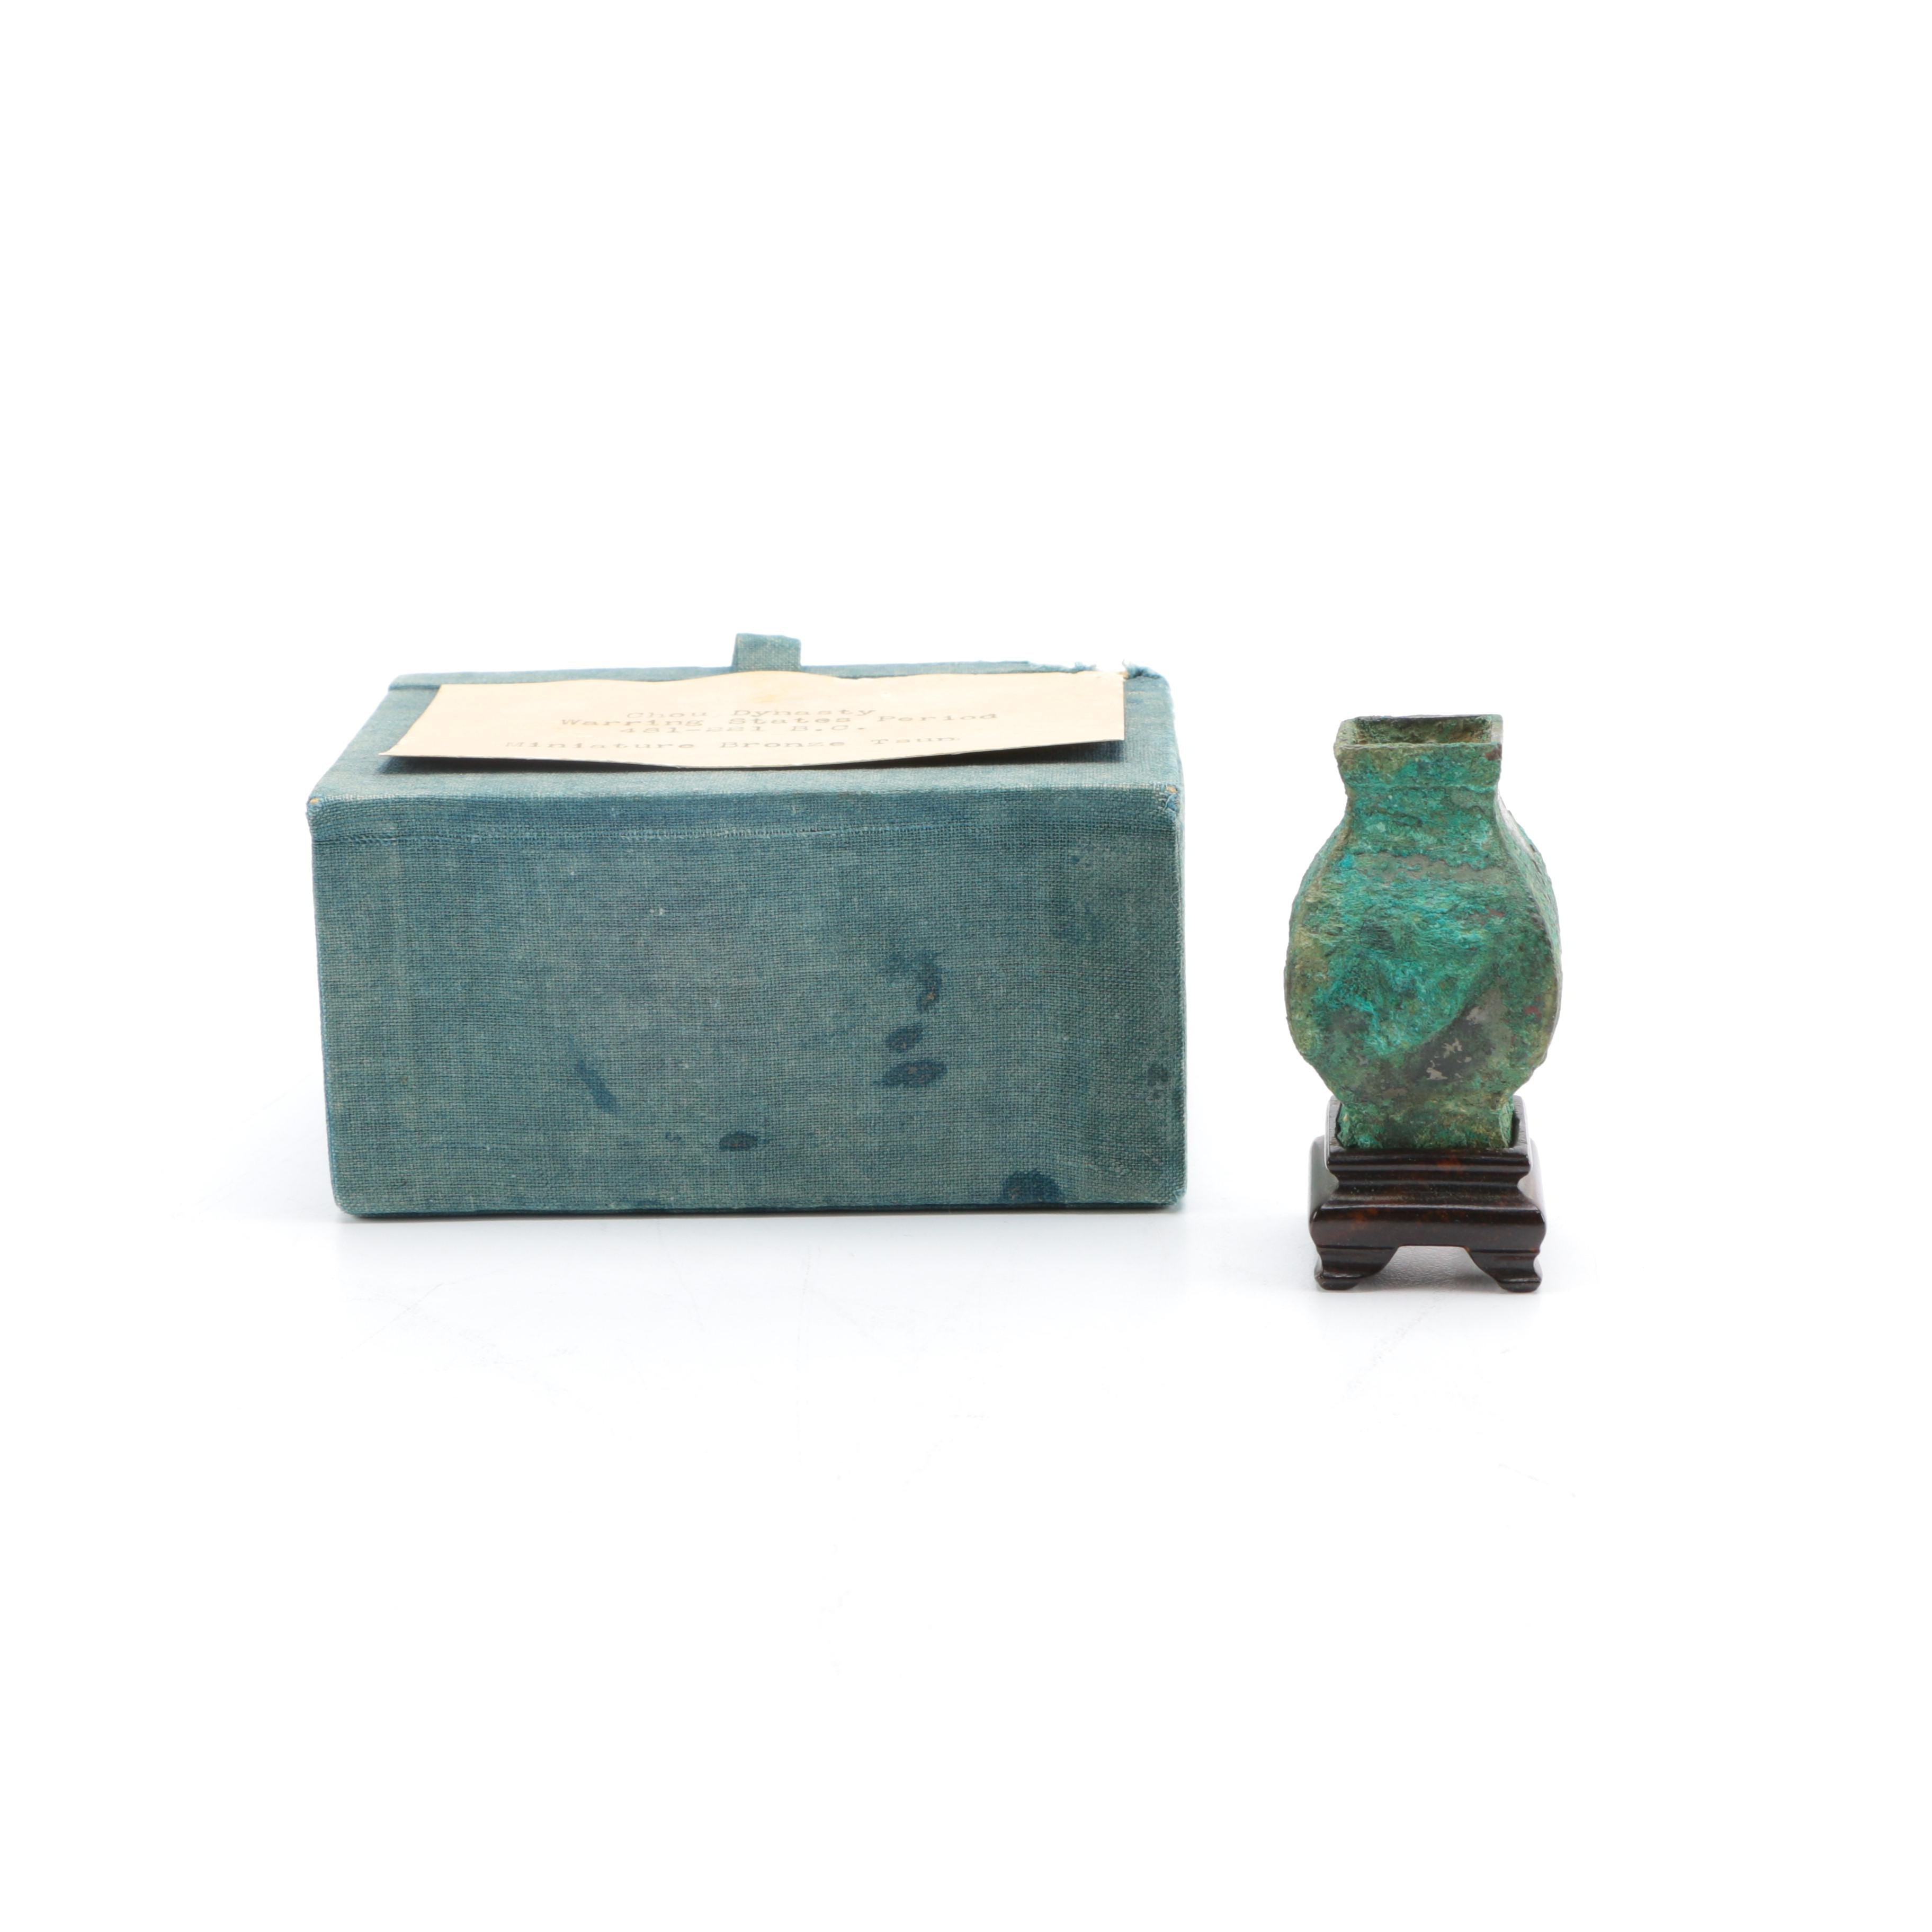 Chinese Miniature Bronze Vase, Fanghu, Warring States